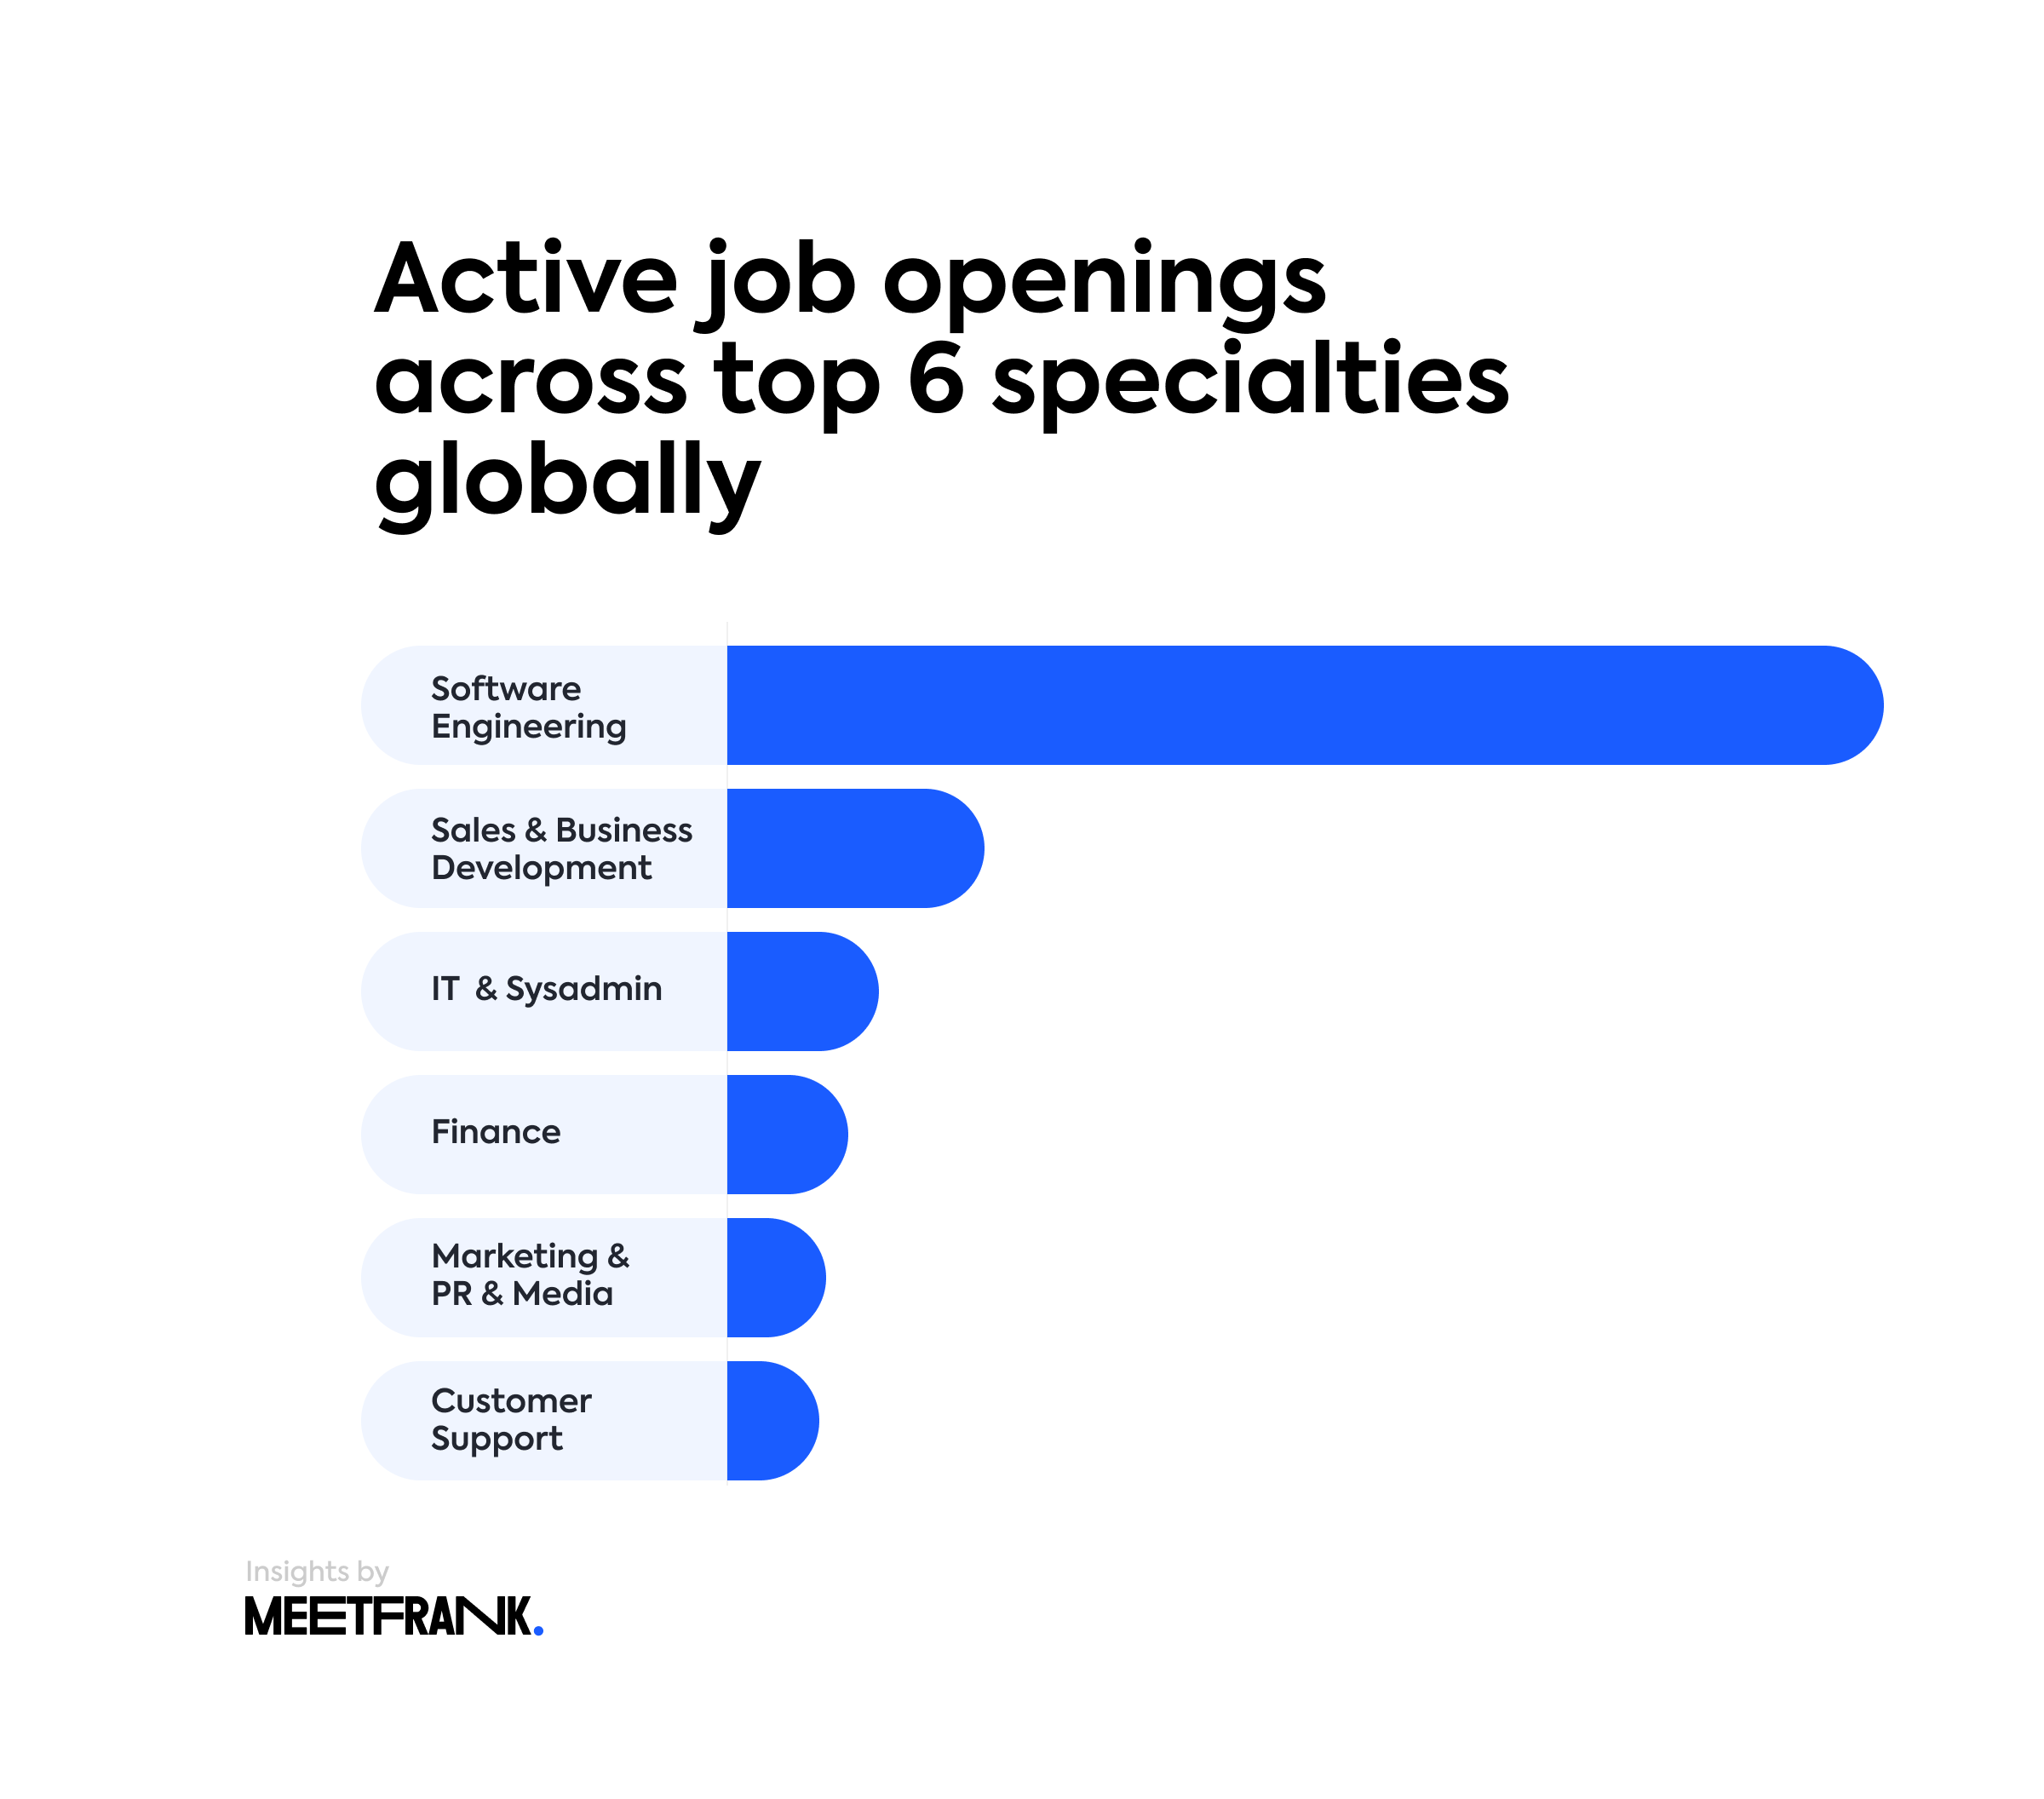 Lithuanian Job Market Report, May 20, 2020